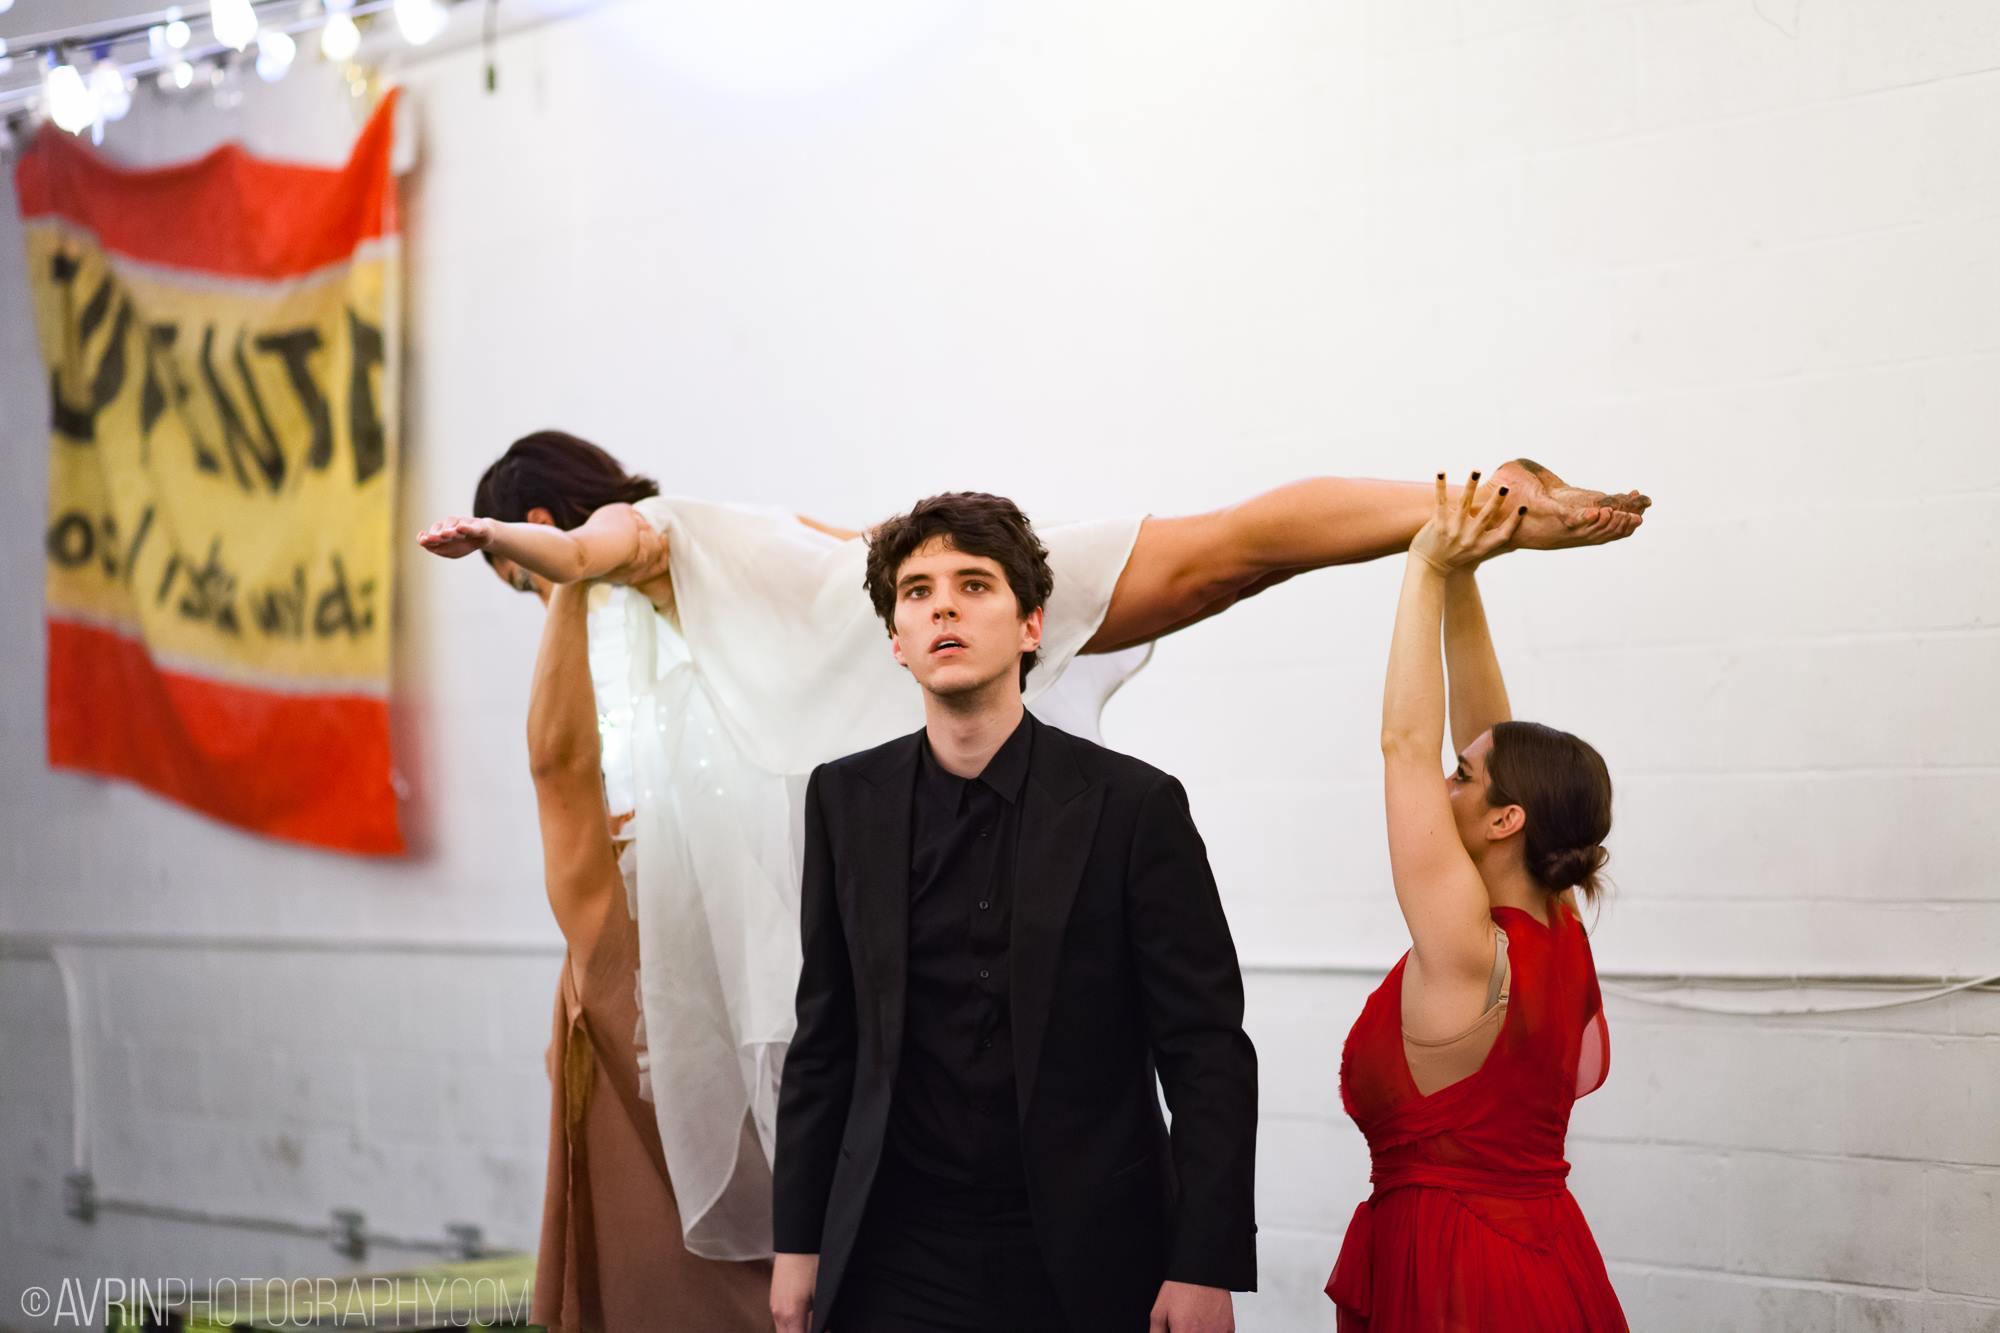 Goyescas, by Bare Opera